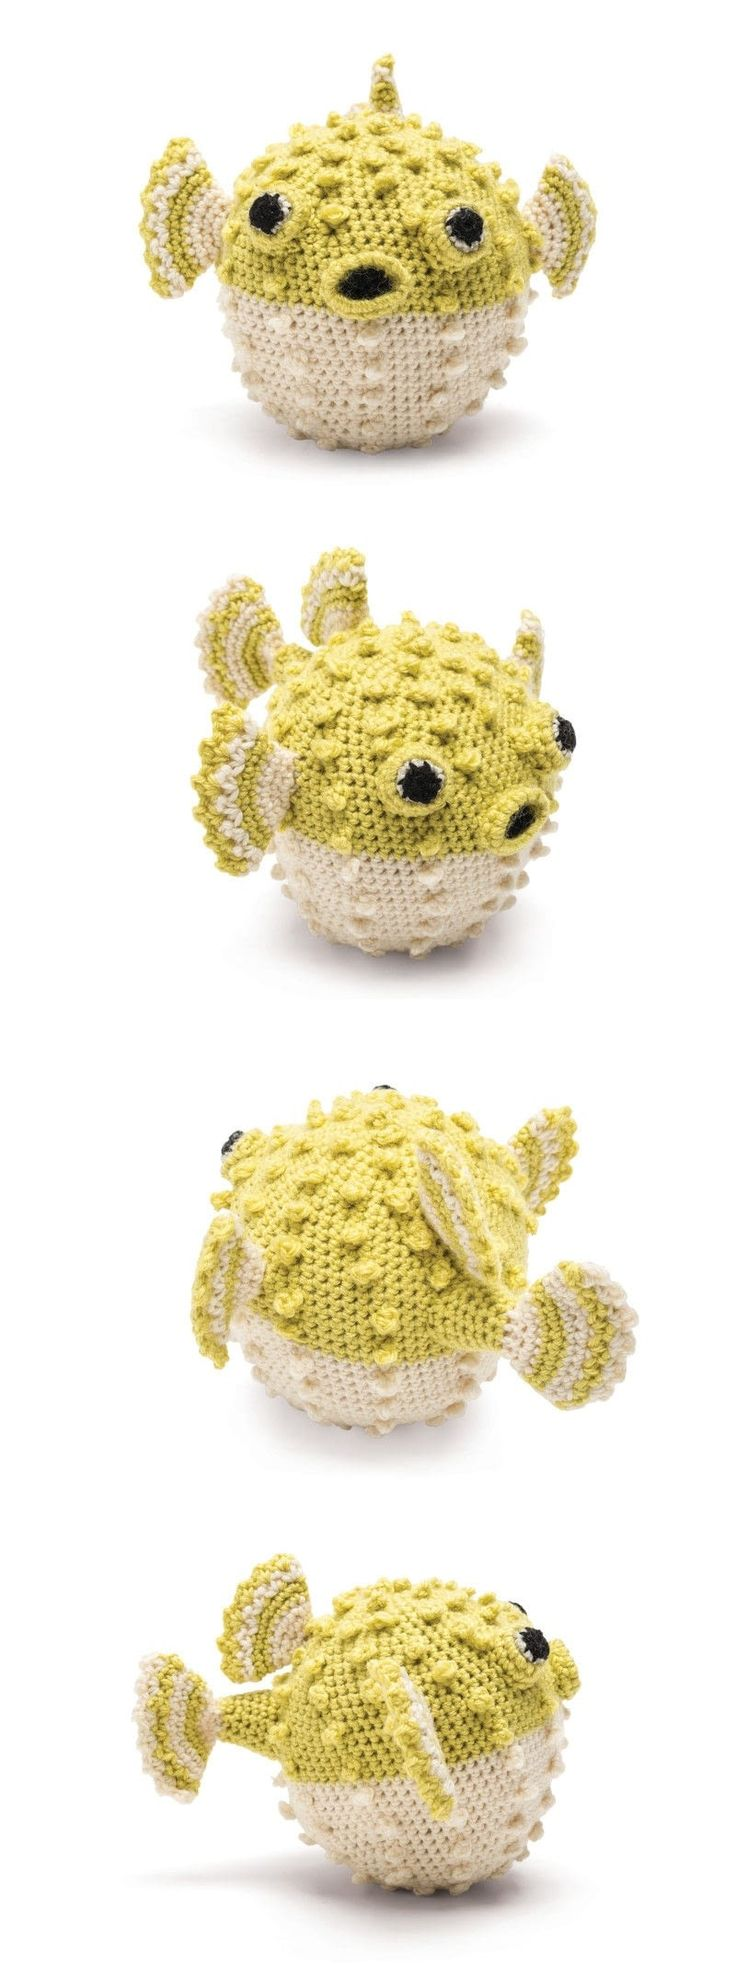 Pez globo de crochet. amigurumi